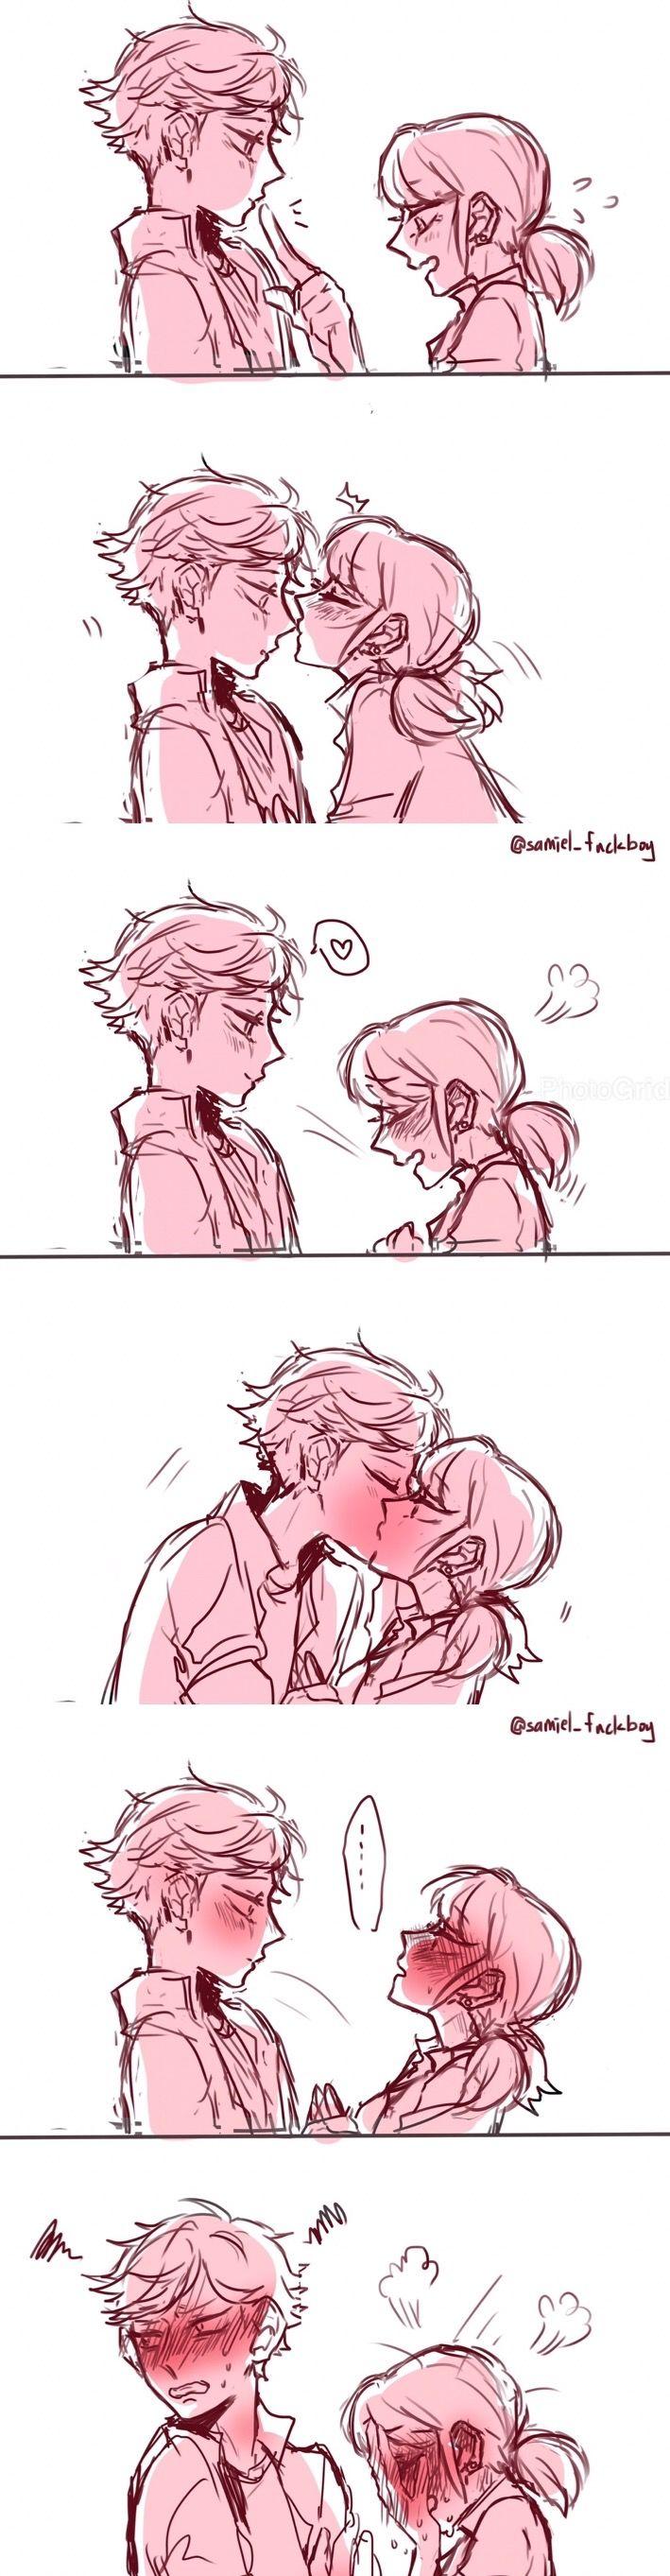 Marinette and Adrien | Kiss | Miraculous Ladybug | love -